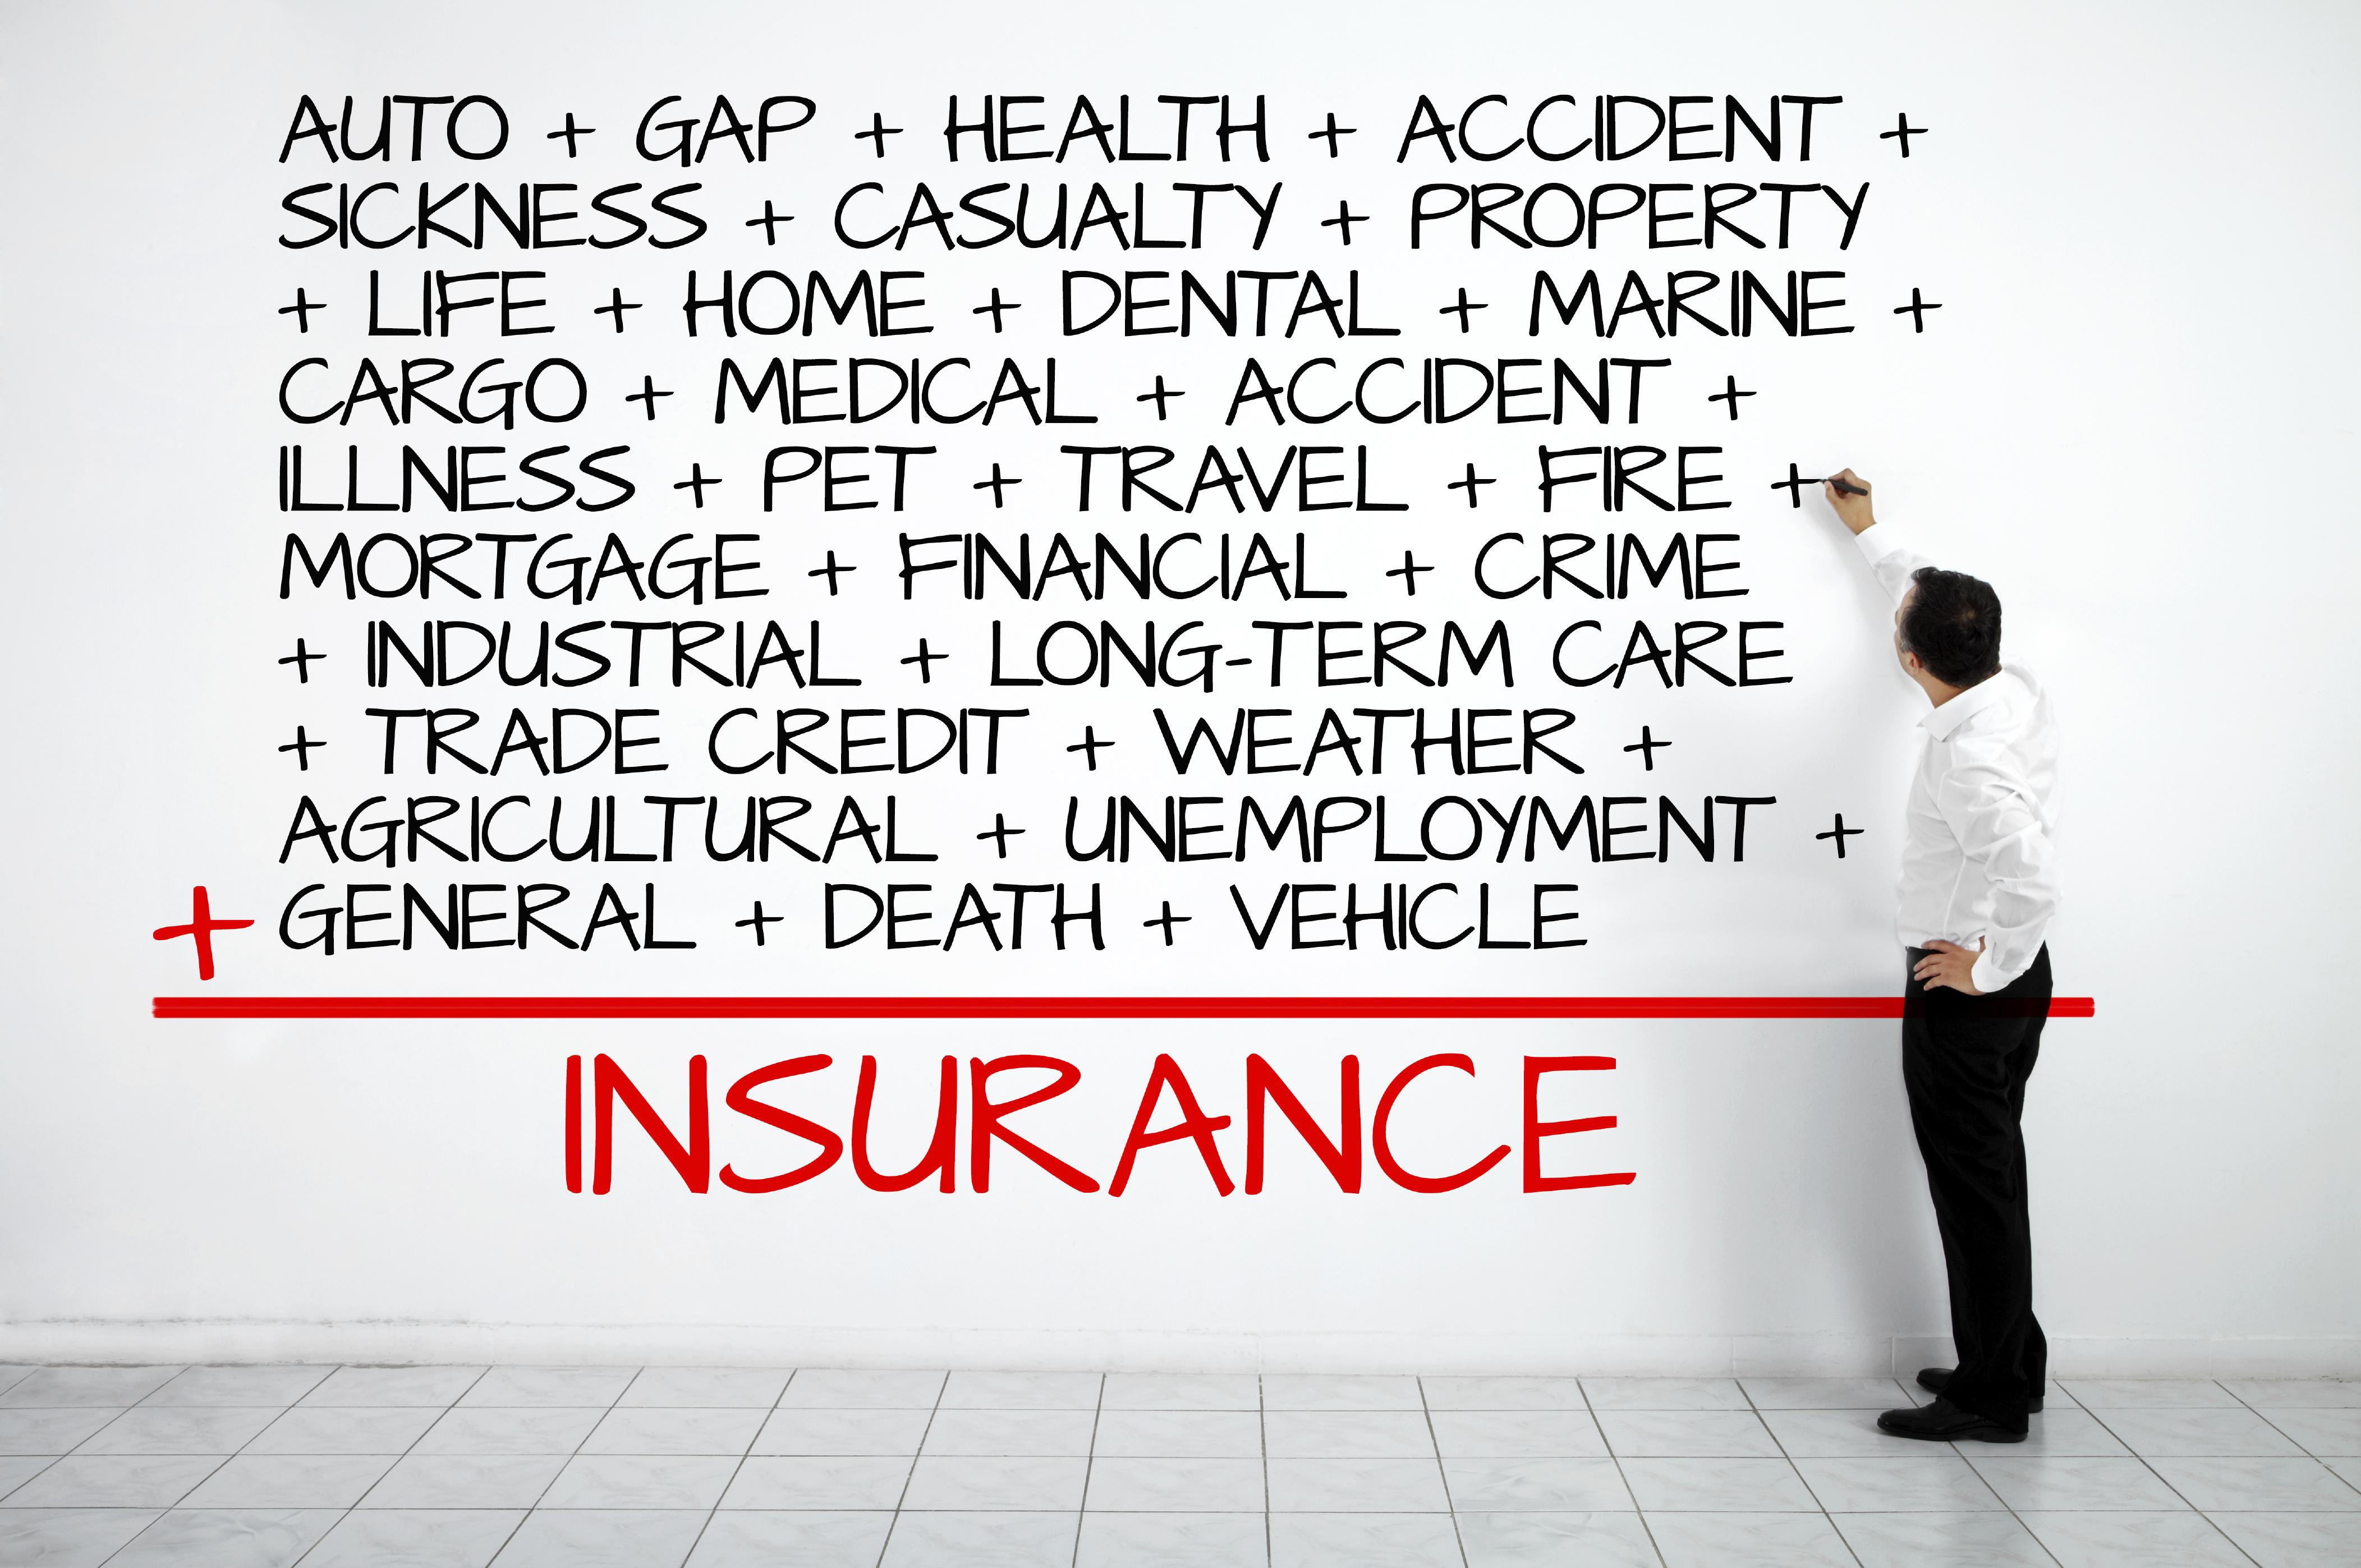 InsuranceLawyer Melbourne